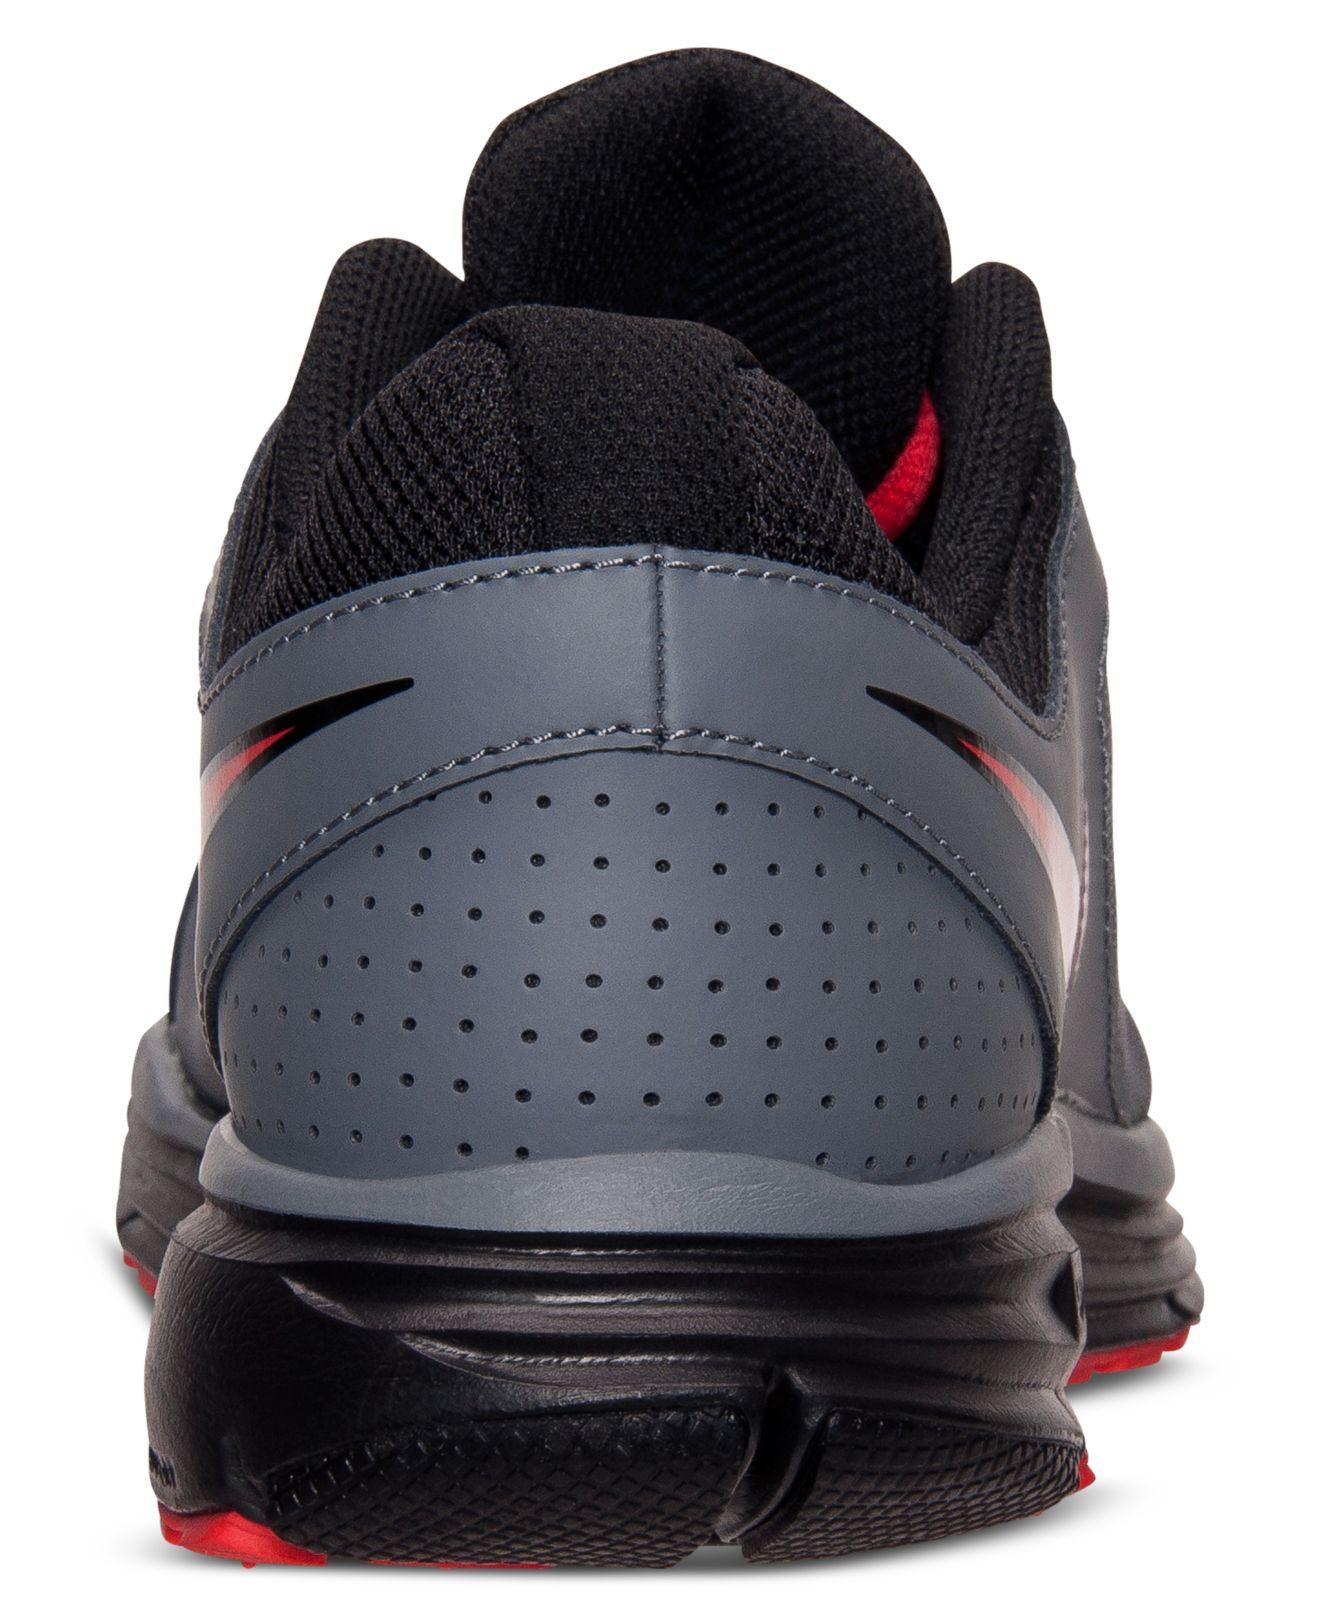 c4b4f6518992 Lyst - Nike Men S Lunar Forever 3 Running Sneakers From Finish Line ...